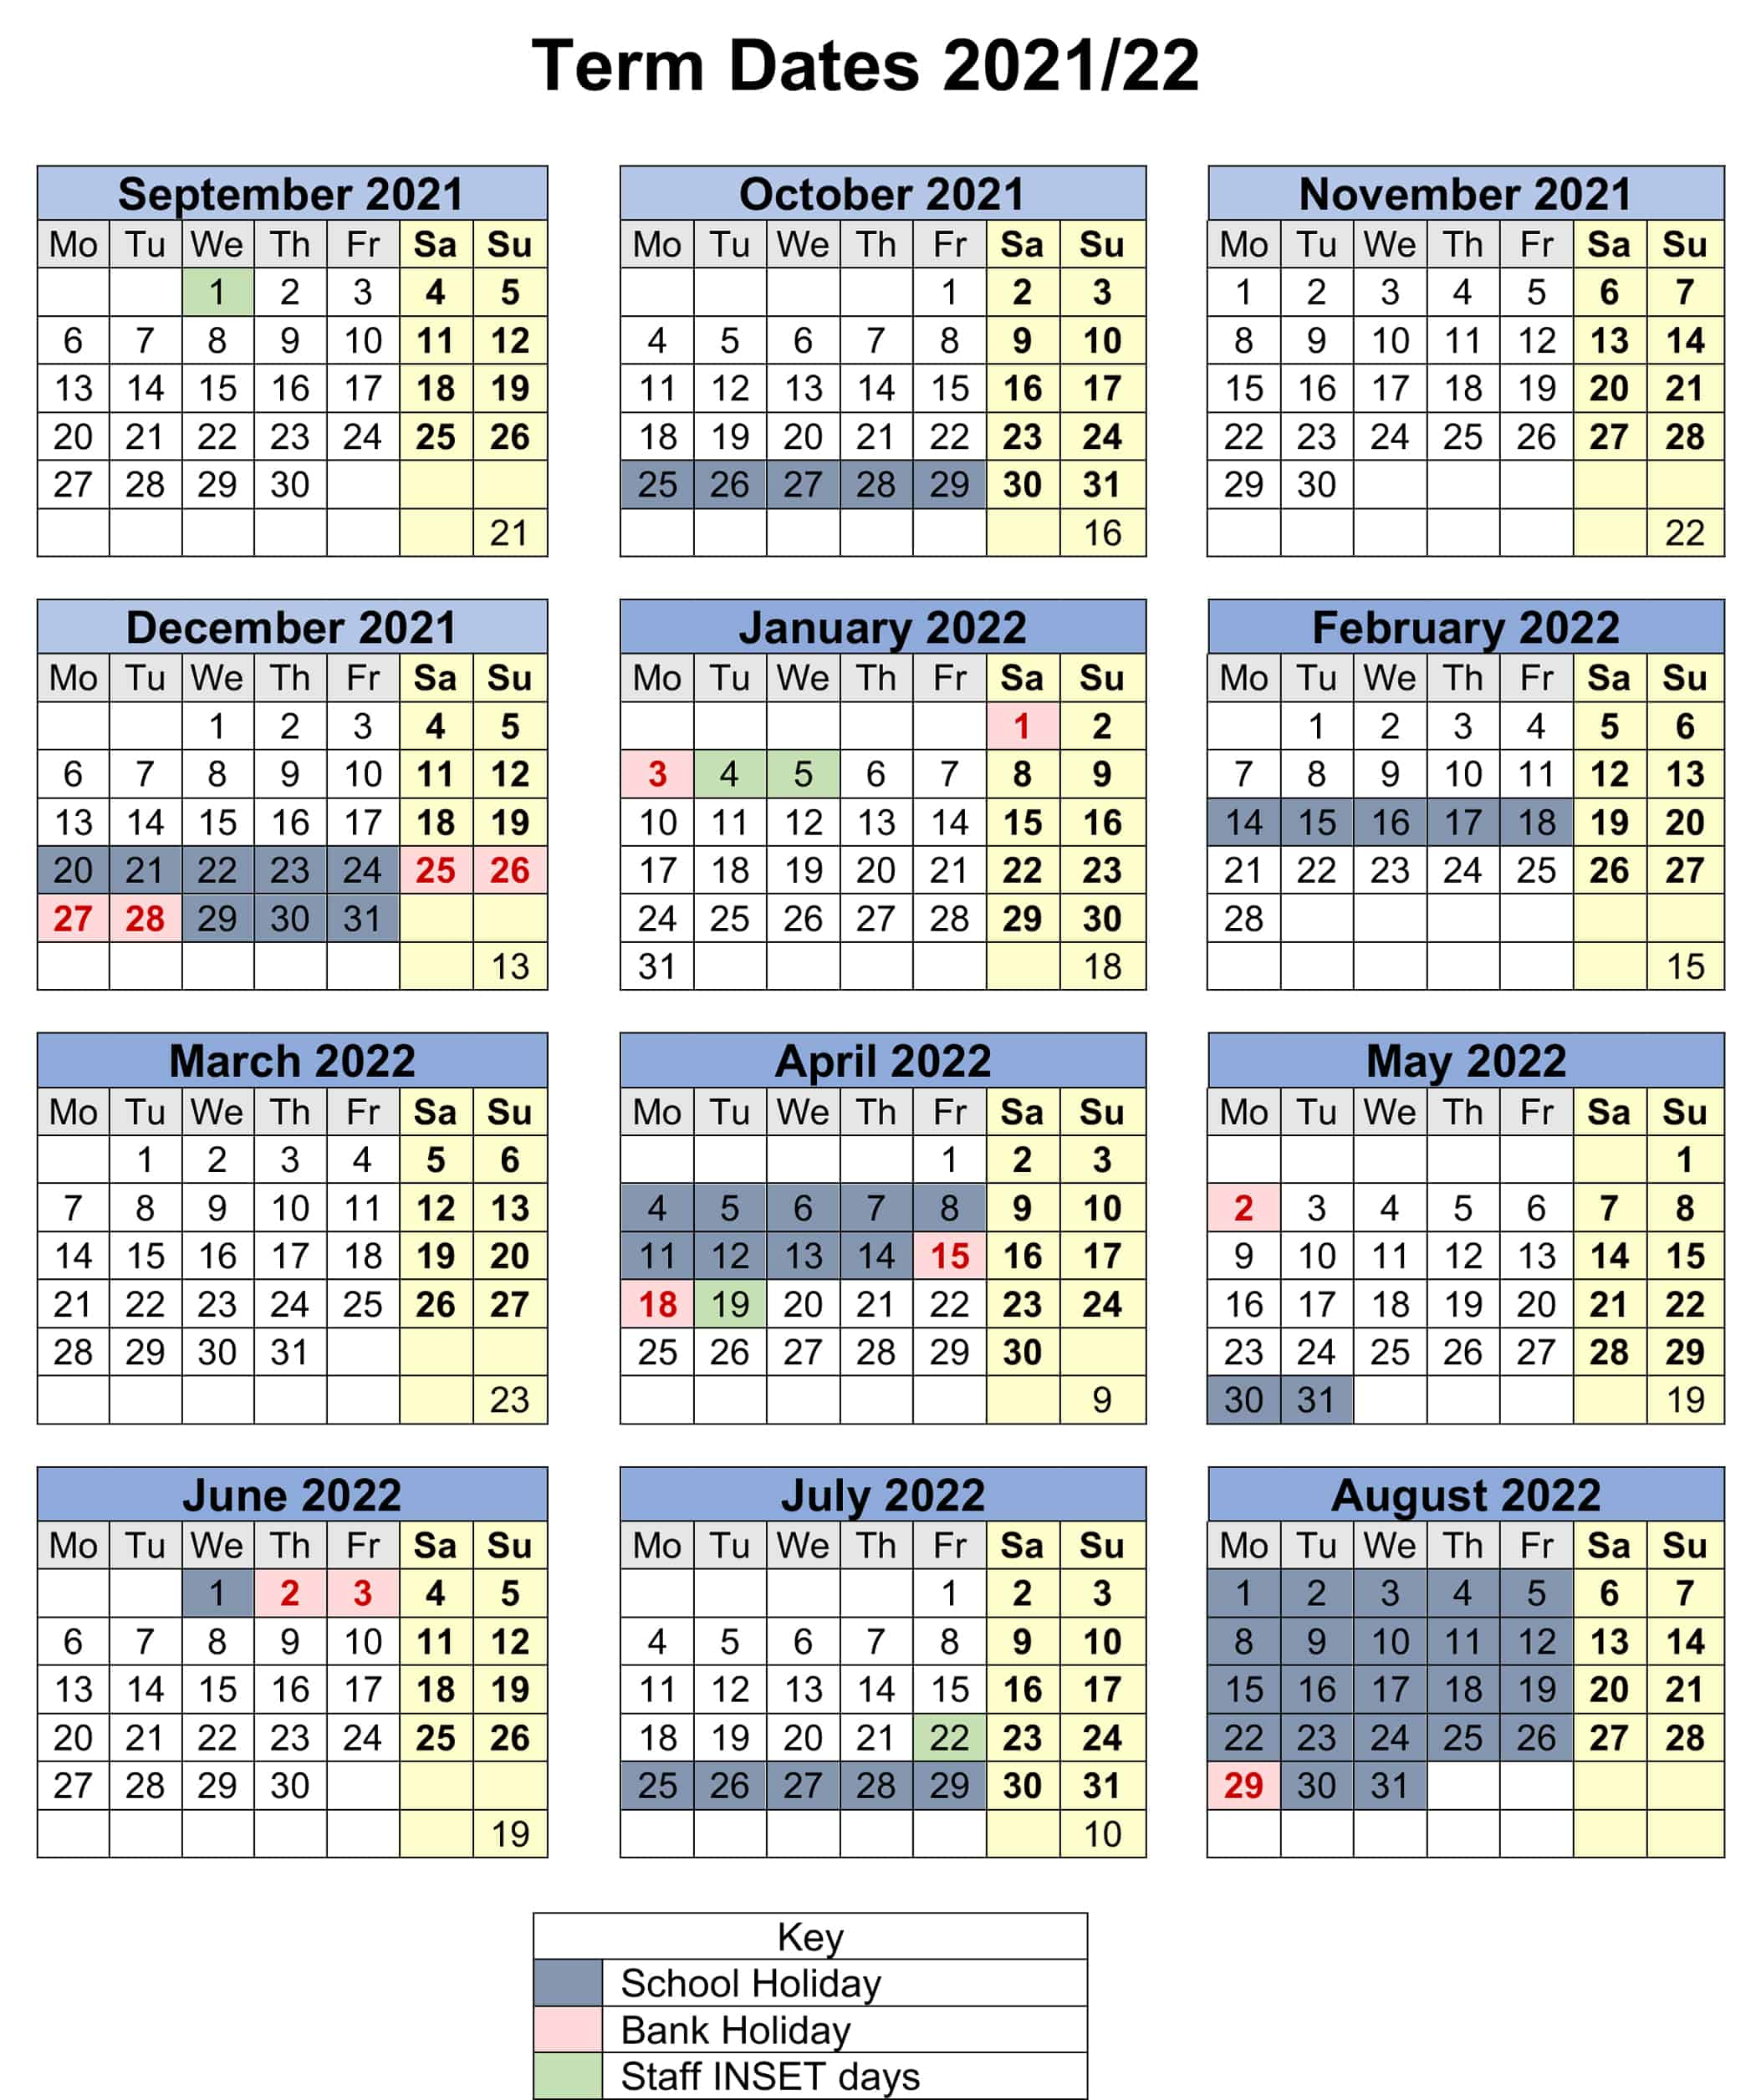 Term dates calendar for The Cavendish school